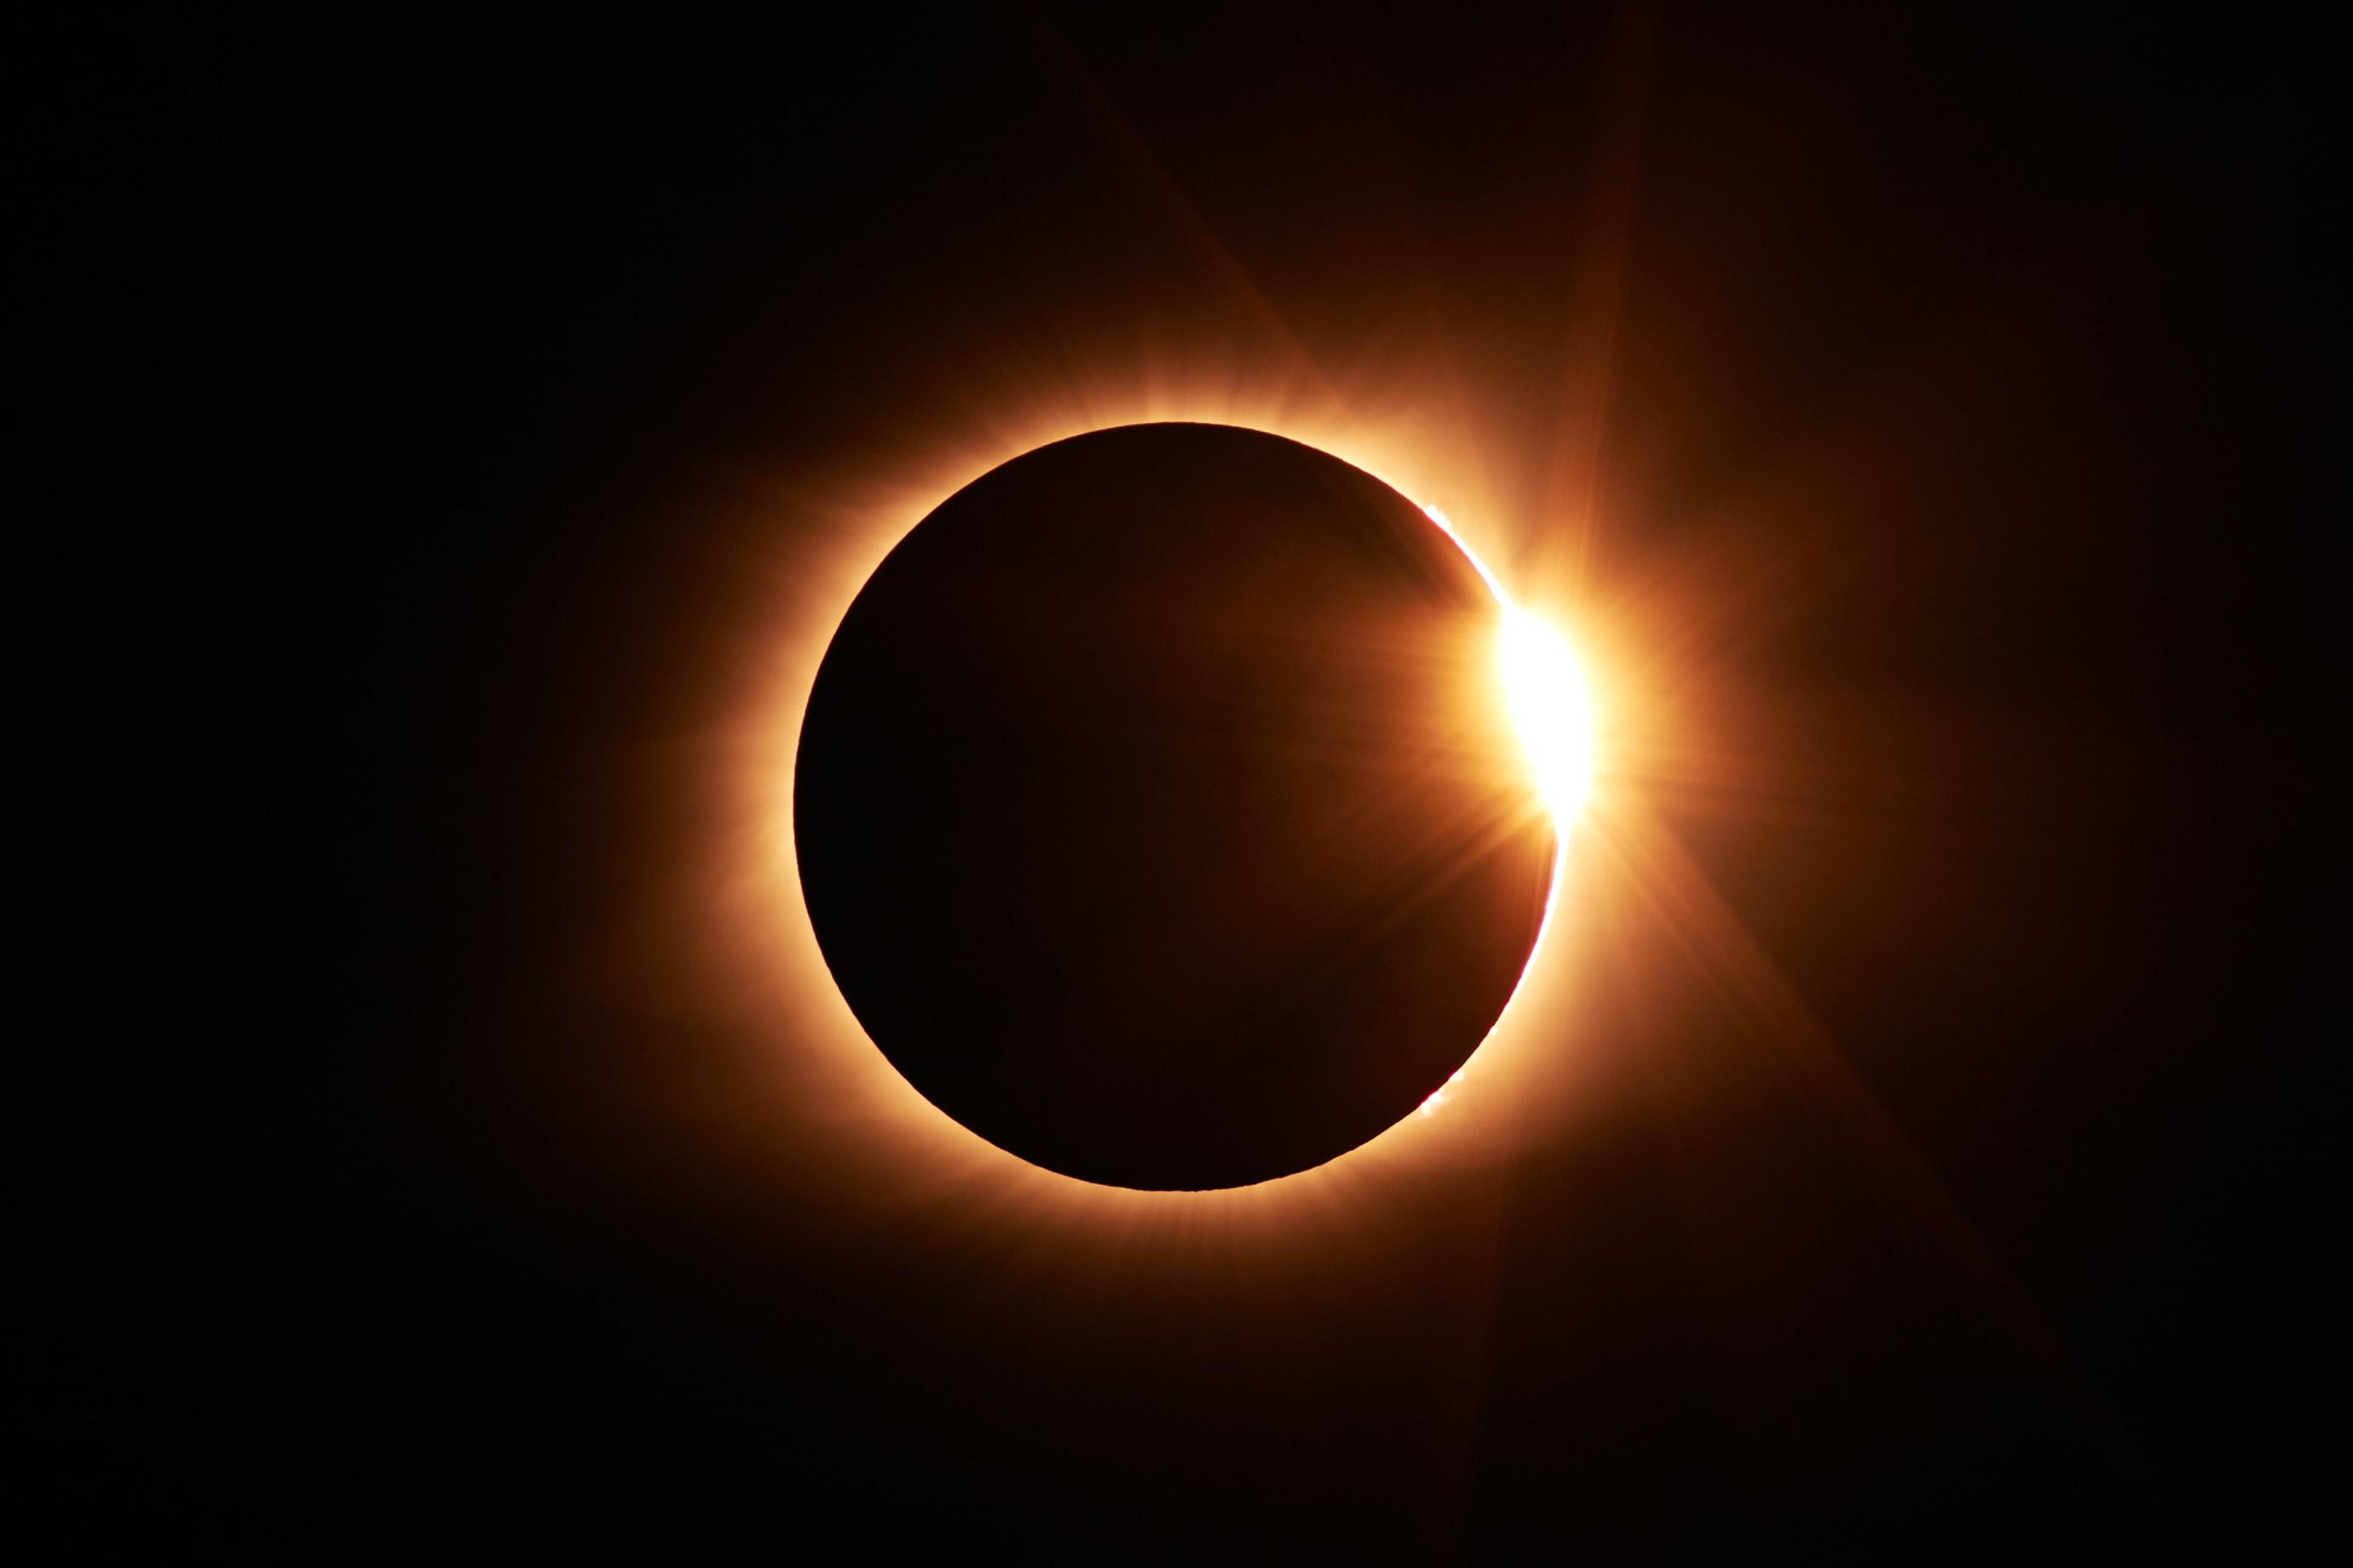 soalr eclipse sagittarius meaning